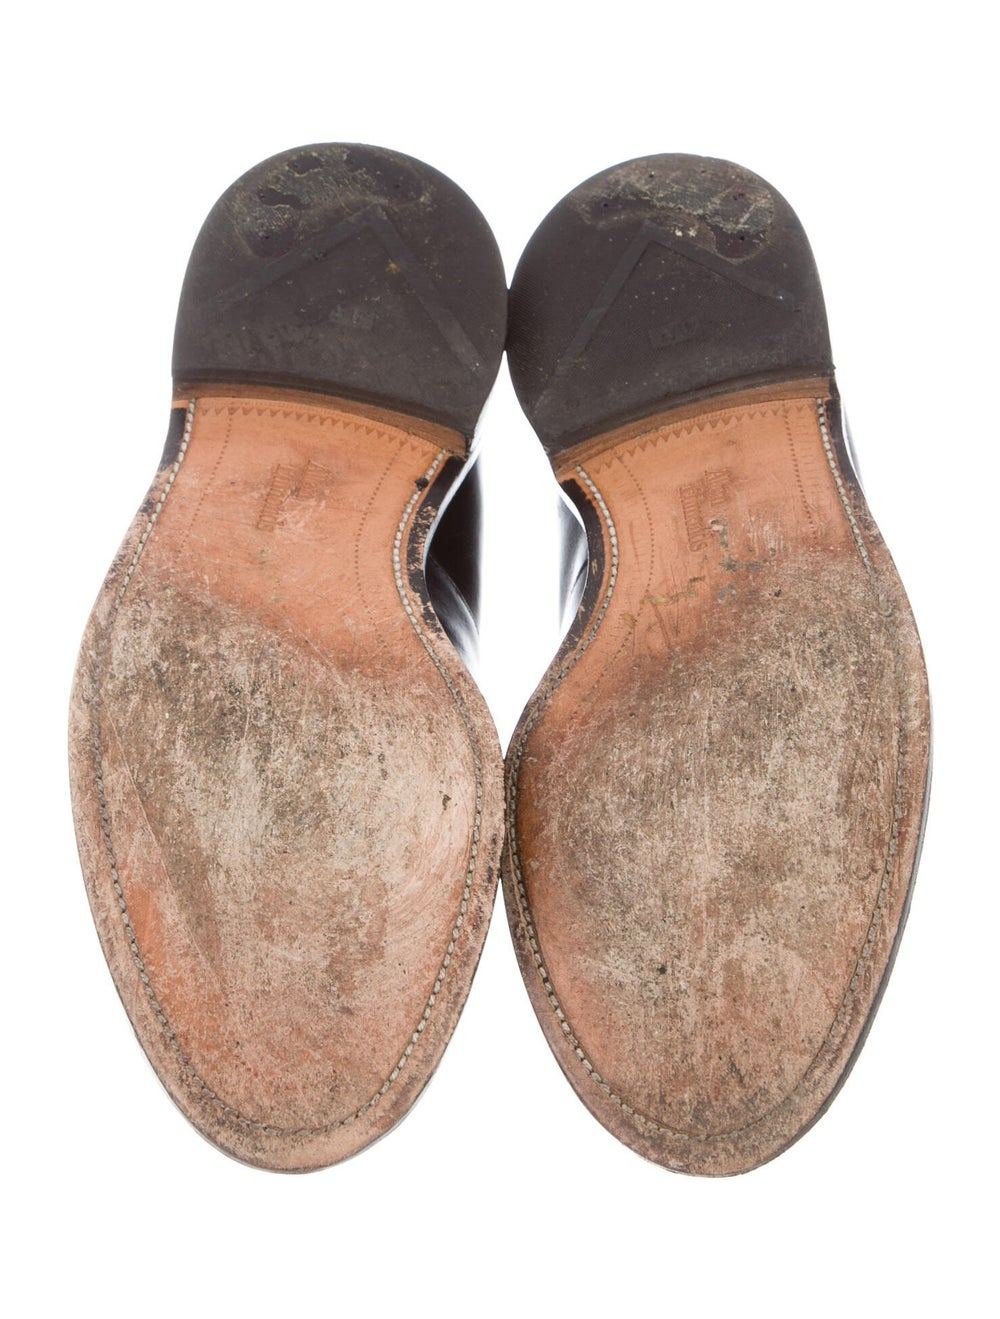 Allen Edmonds Leather Penny Loafers black - image 5